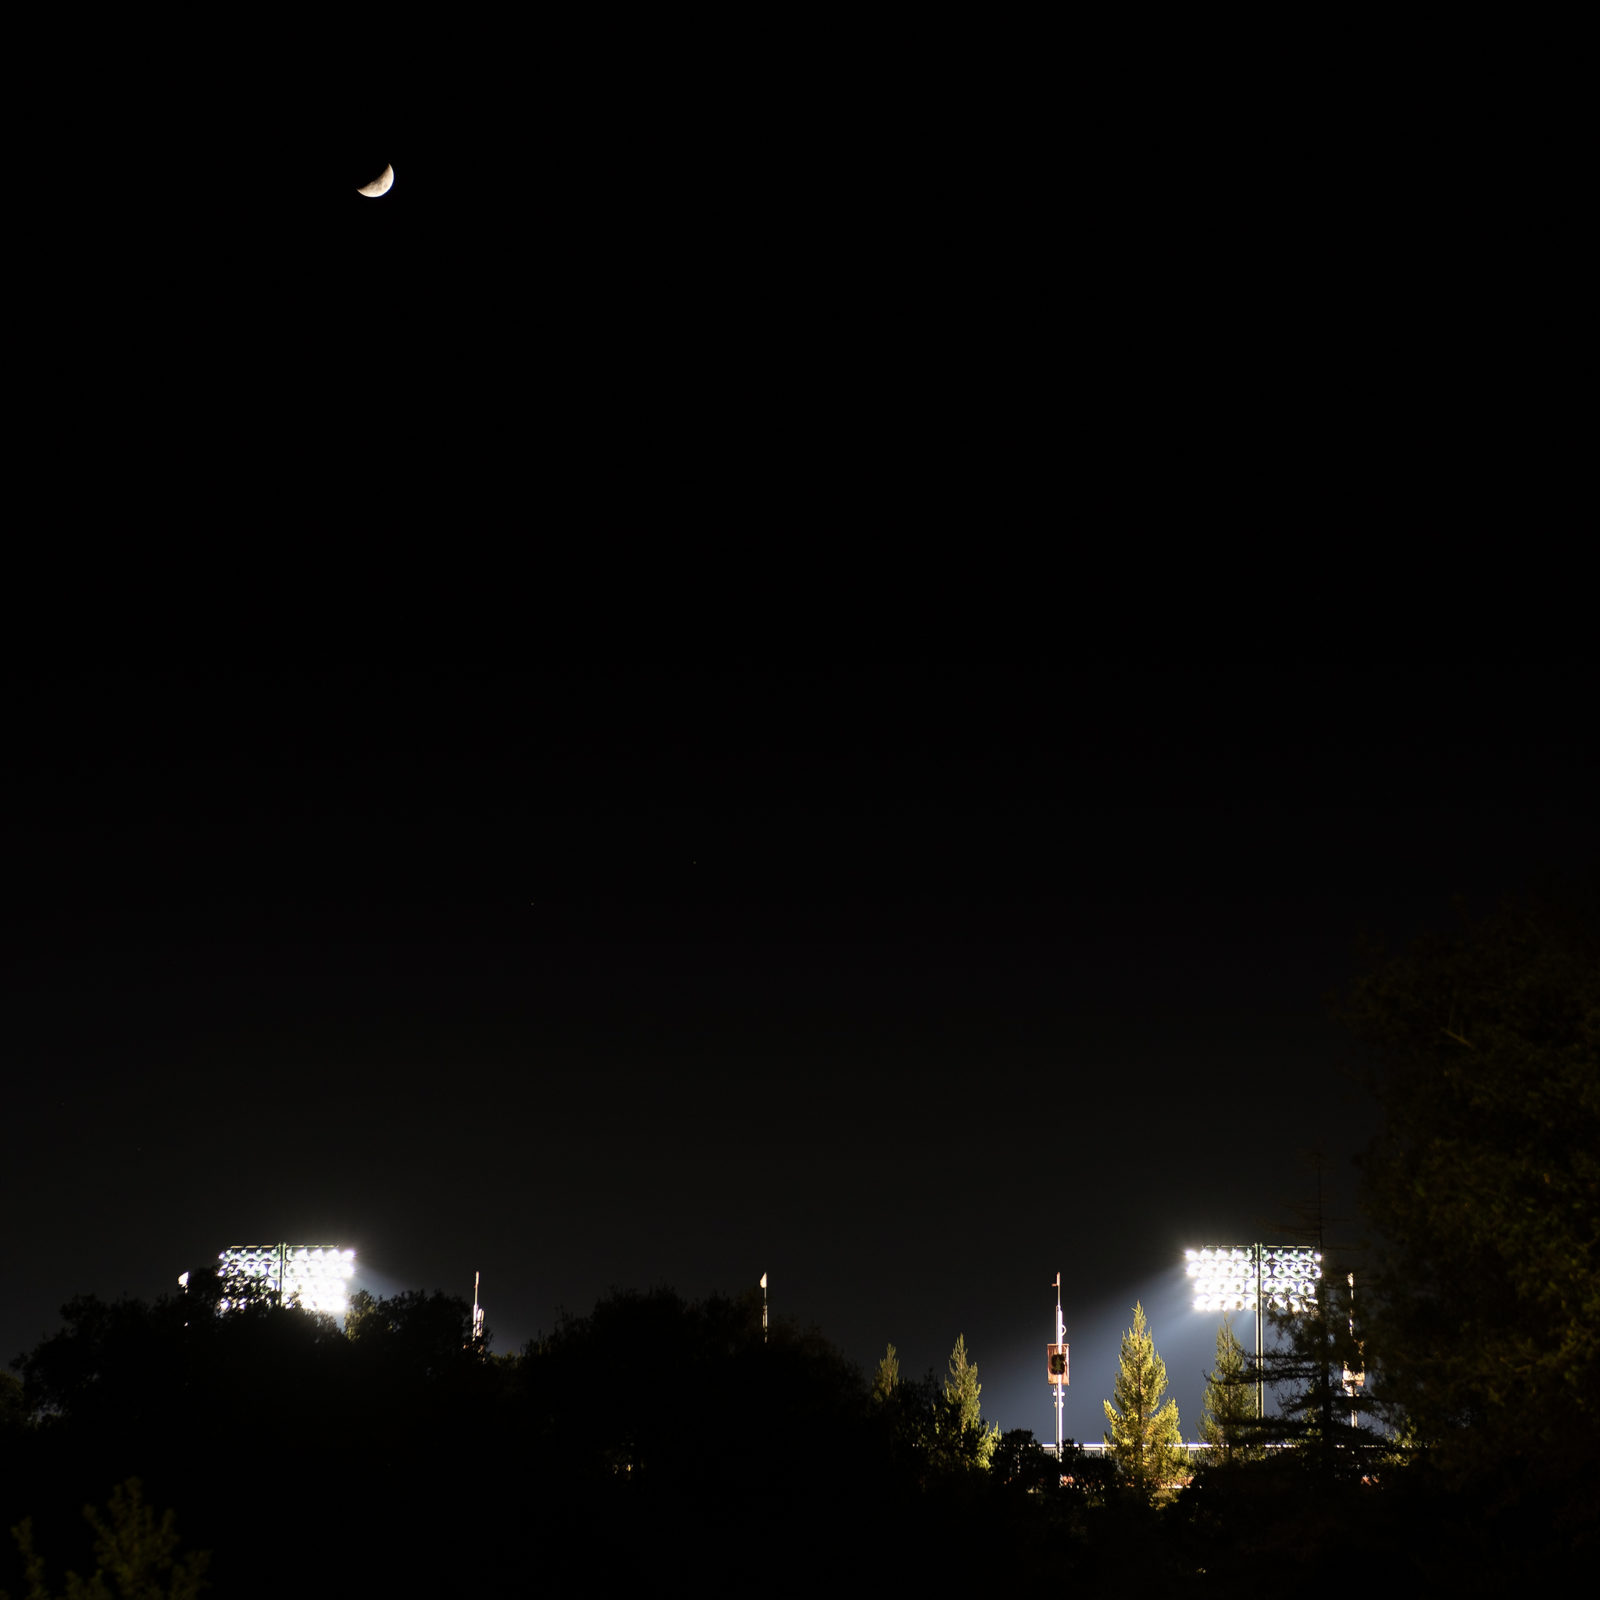 38.8% Crescent Moon over Stanford Stadium